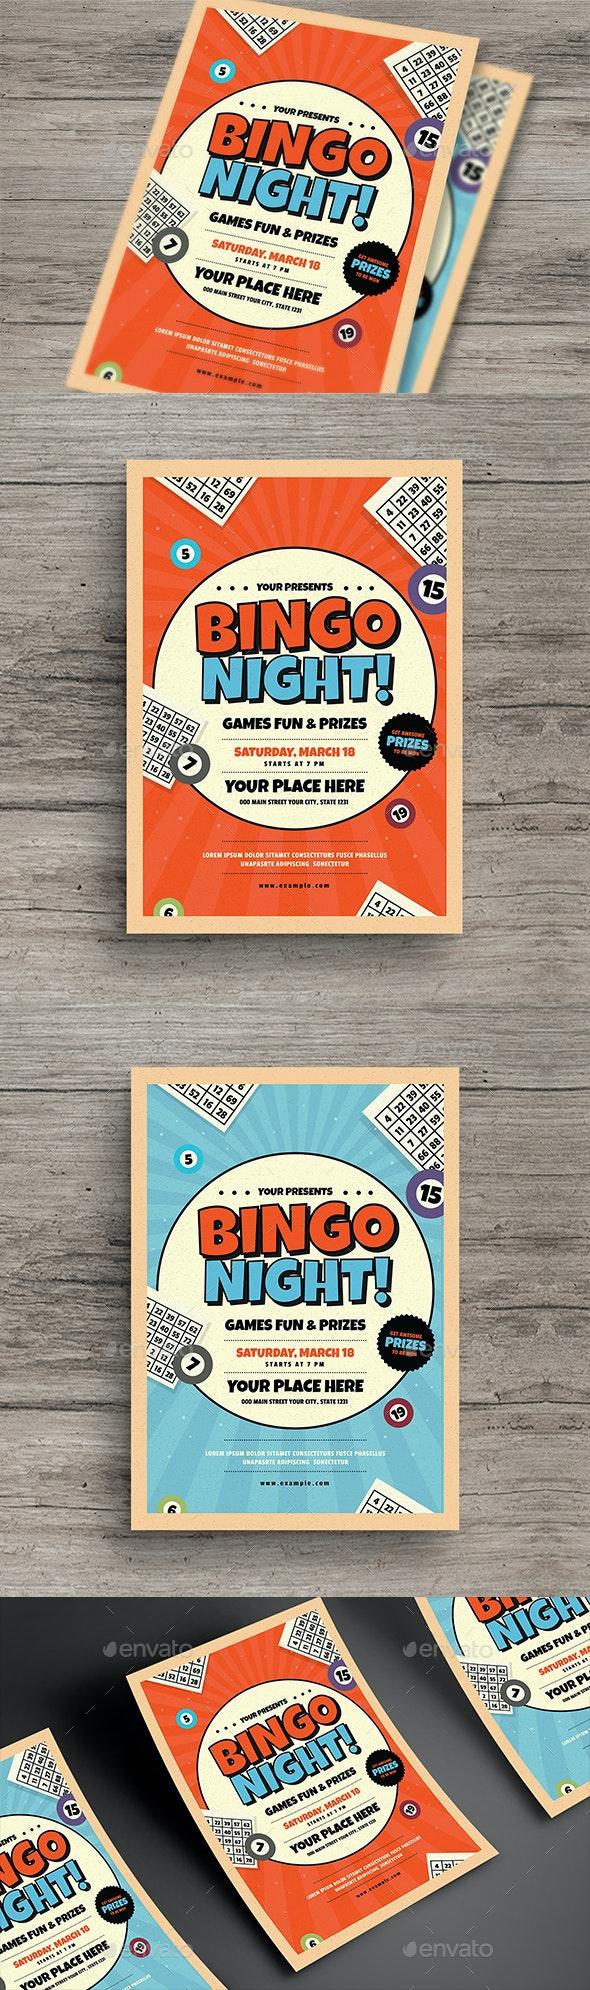 Bingo Night Event Flyer - Miscellaneous Events